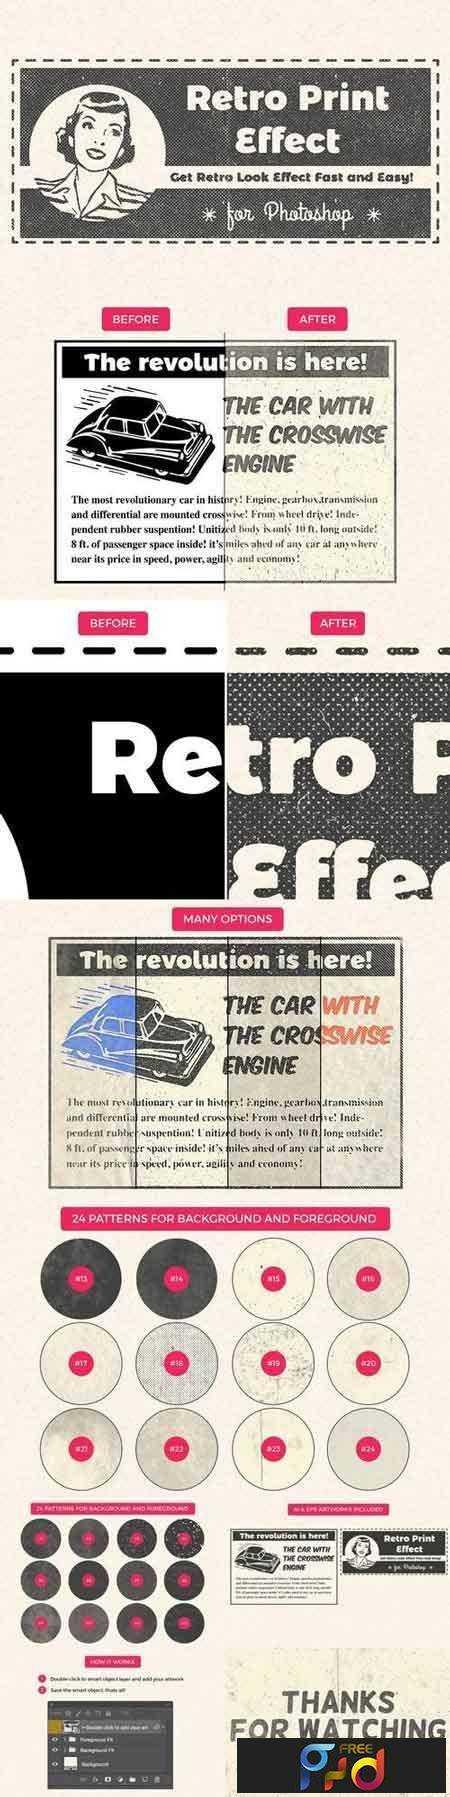 1708026 Retro Print Effect 1457843 1